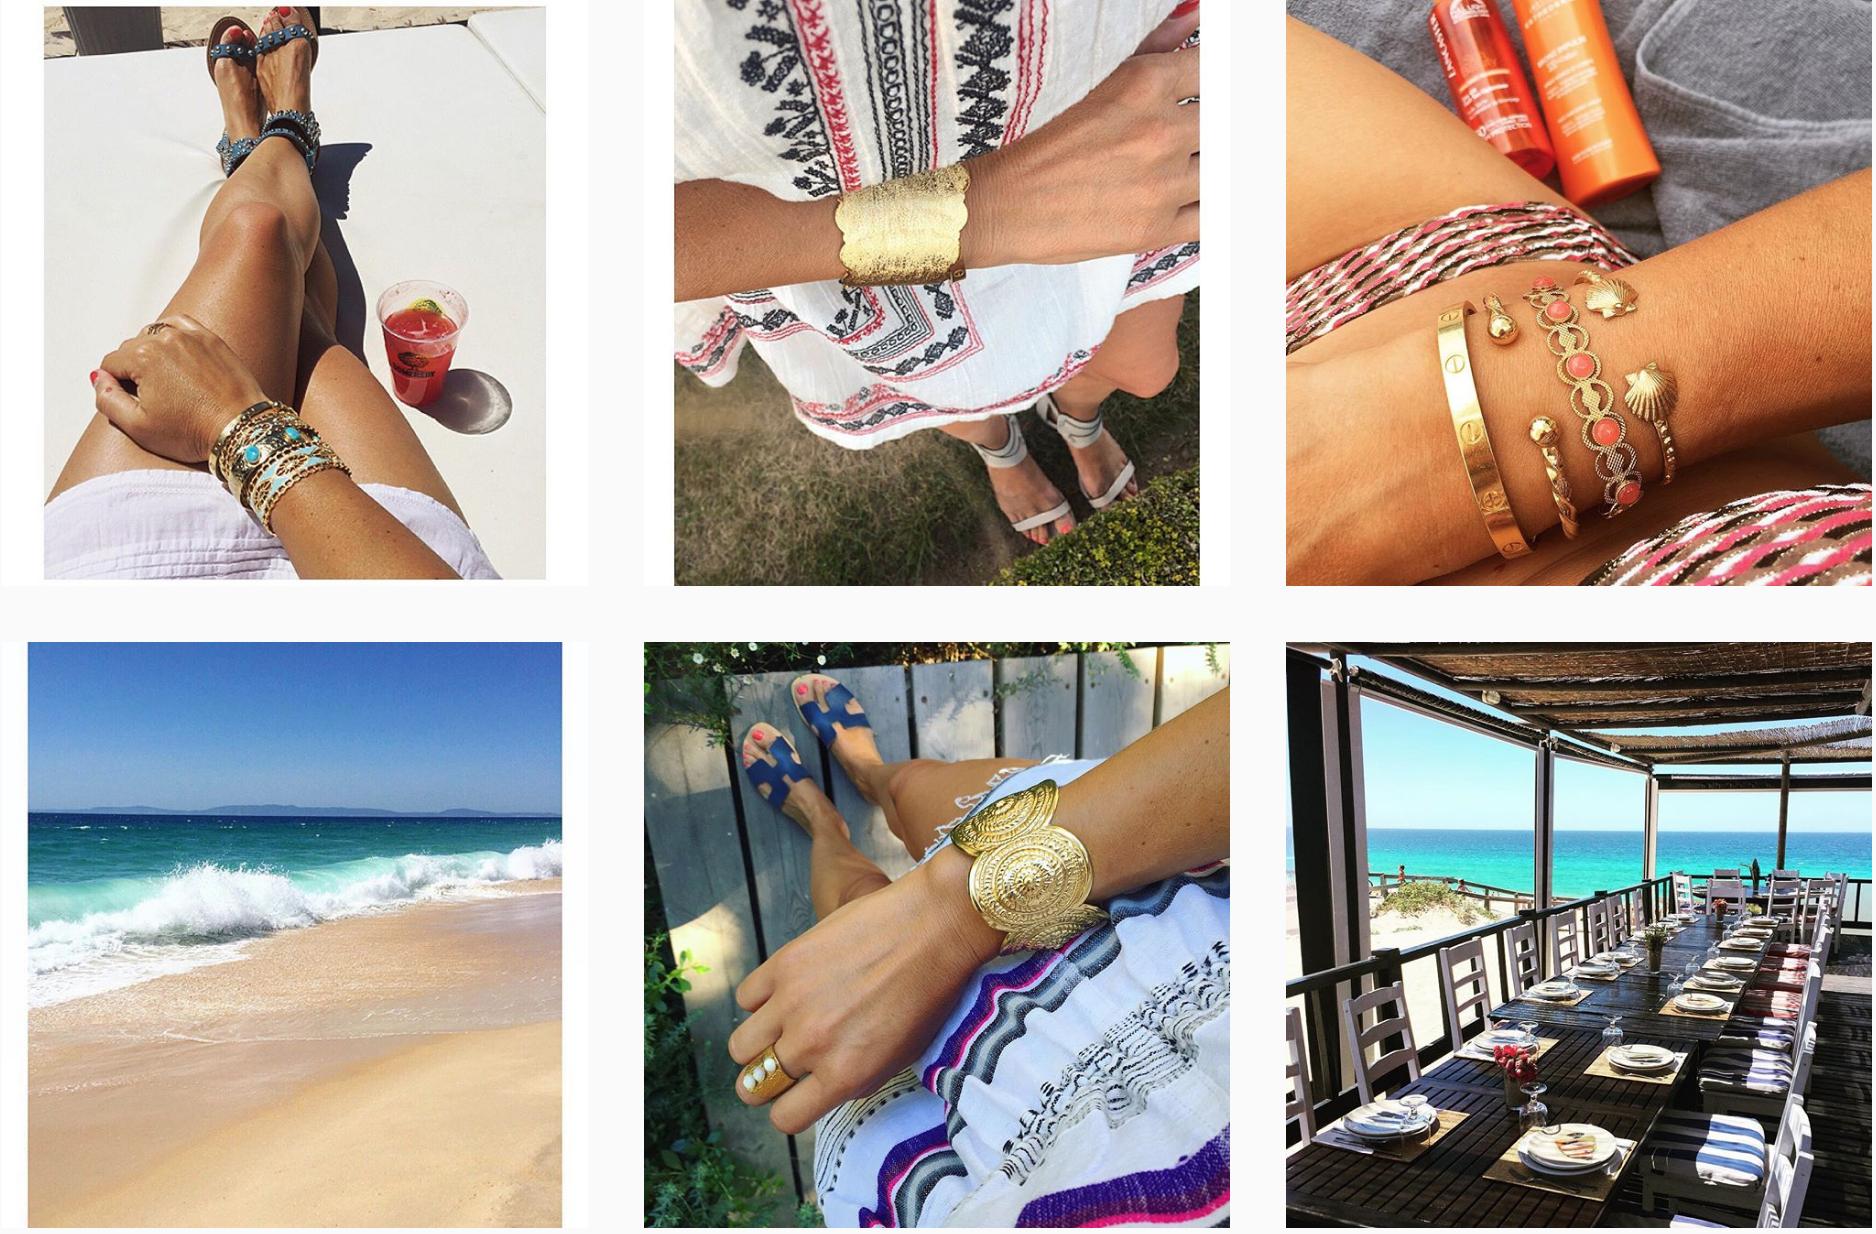 Instagram @dearcharlottebijoux